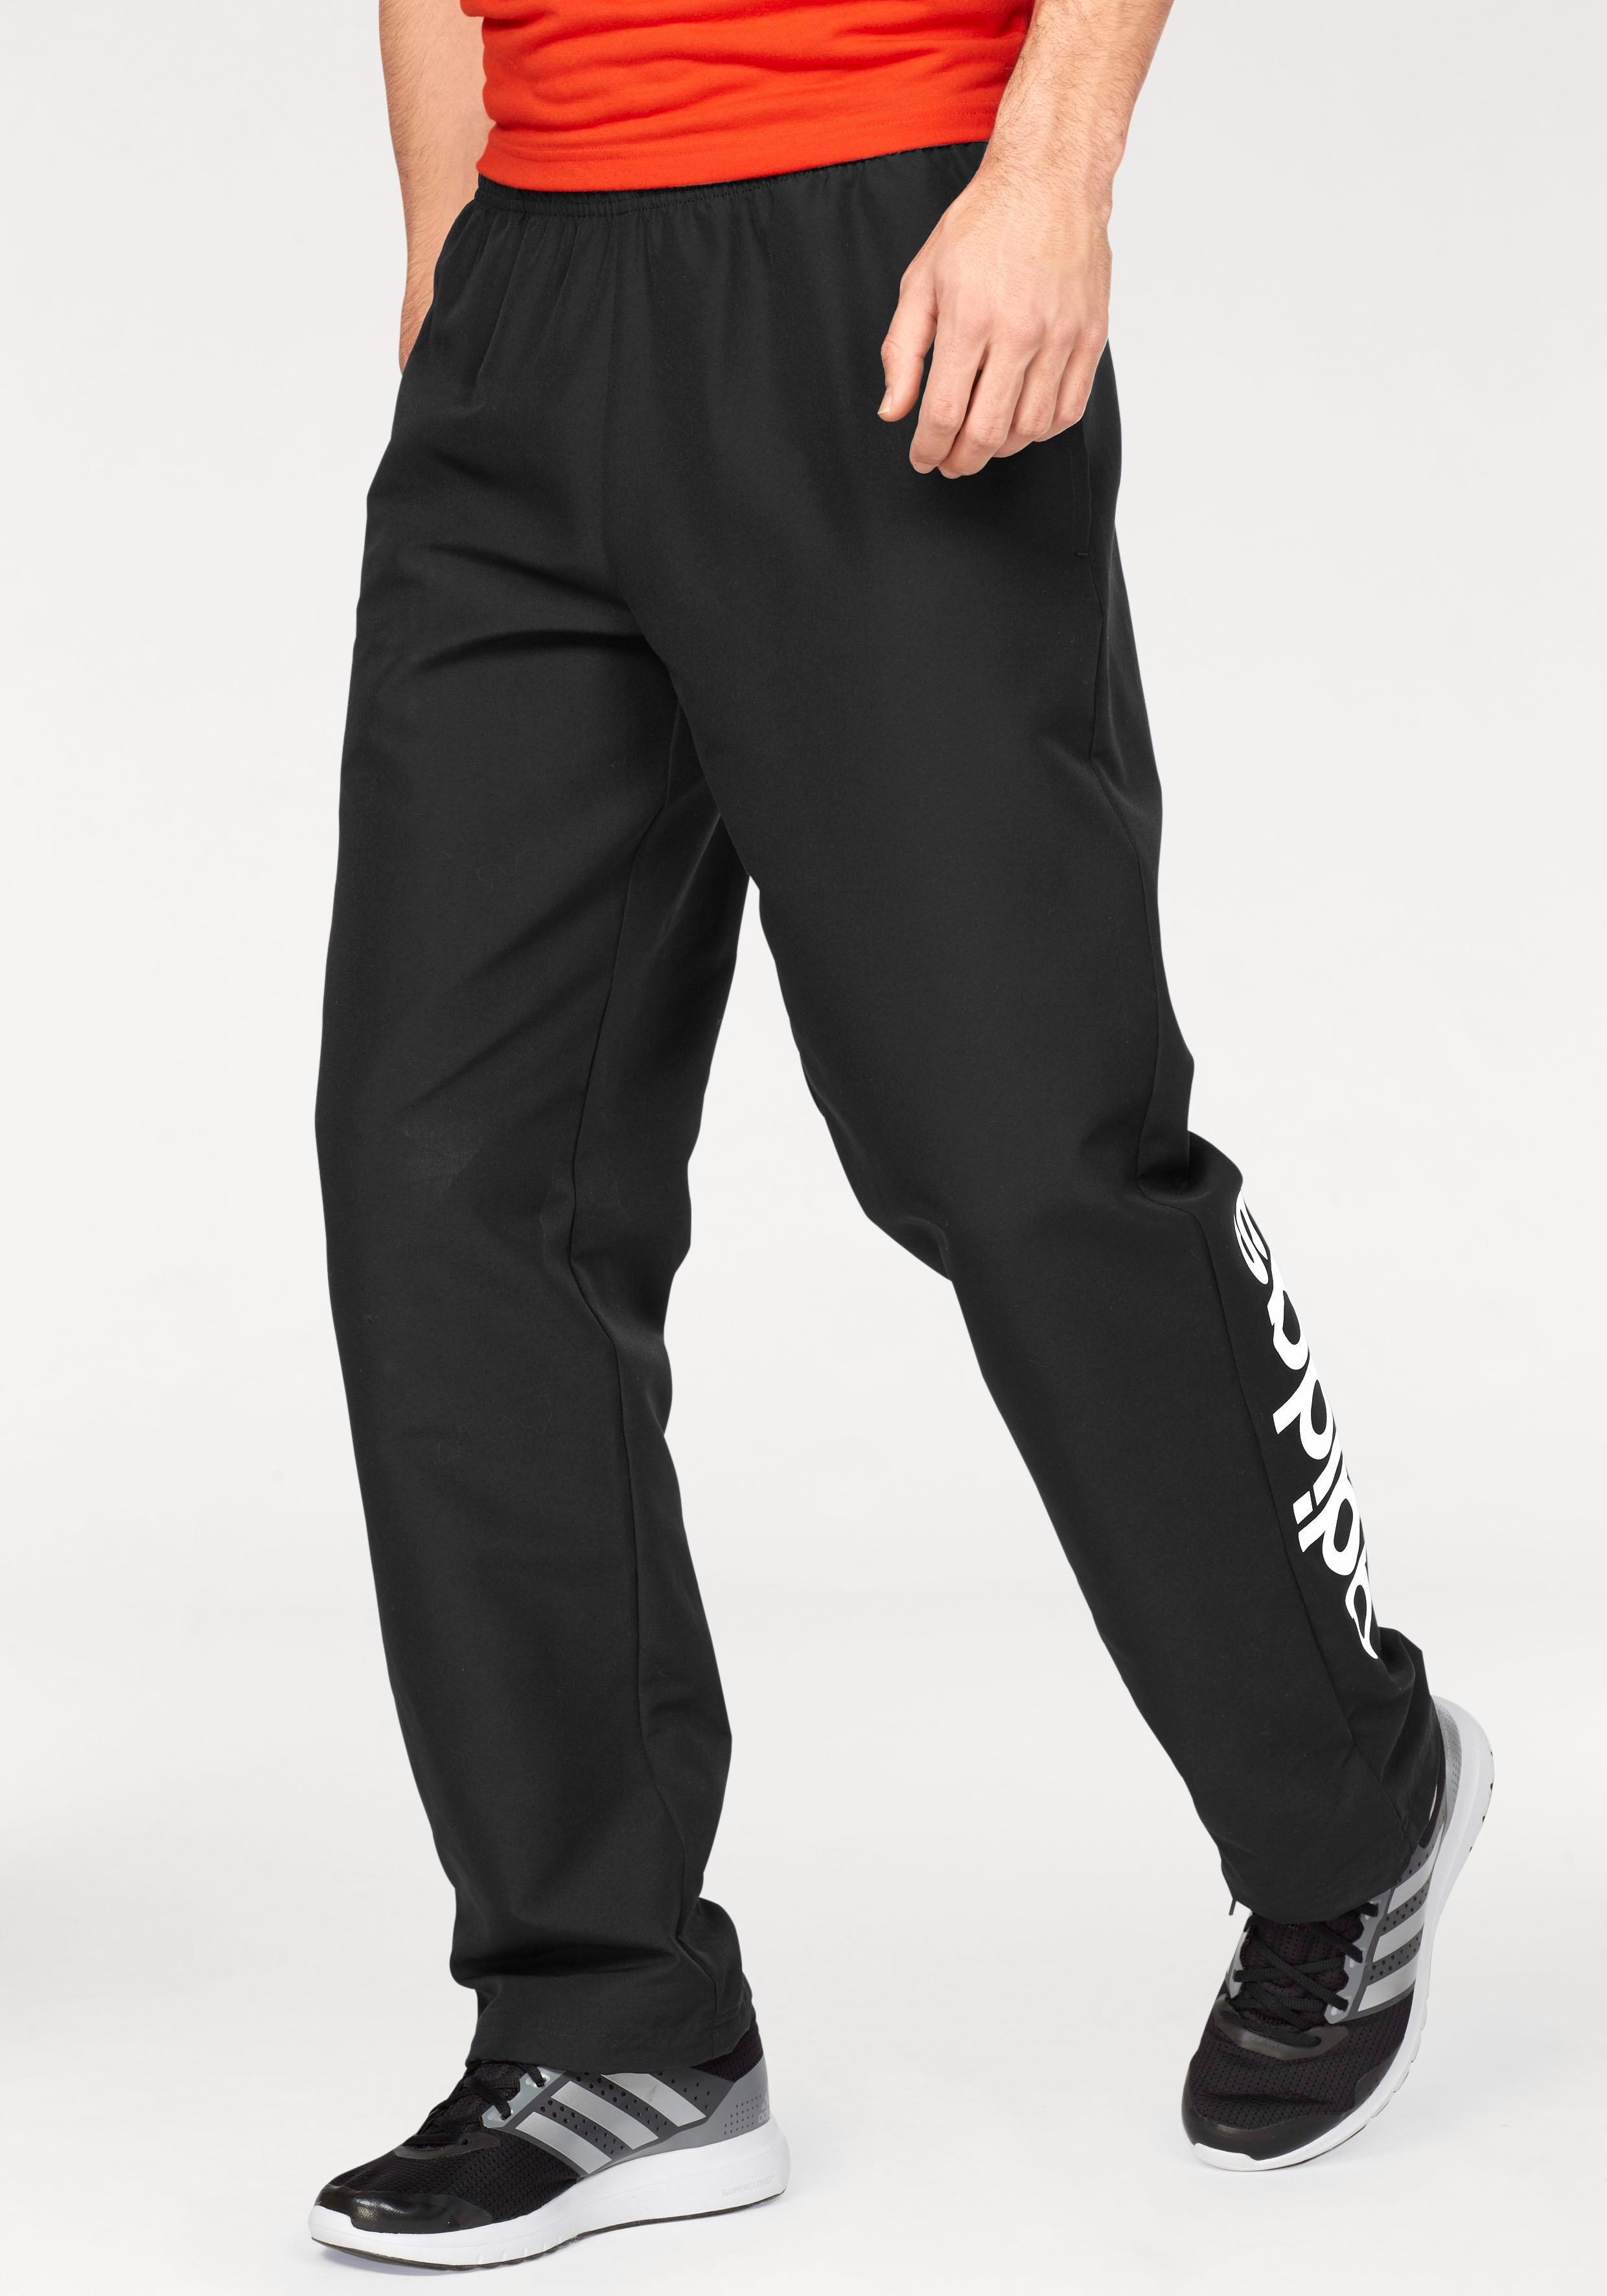 939e03b3e48 Afbeeldingsbron: adidas Performance sportbroek »ESSENTIALS LINEAR STANFORD  PANT«